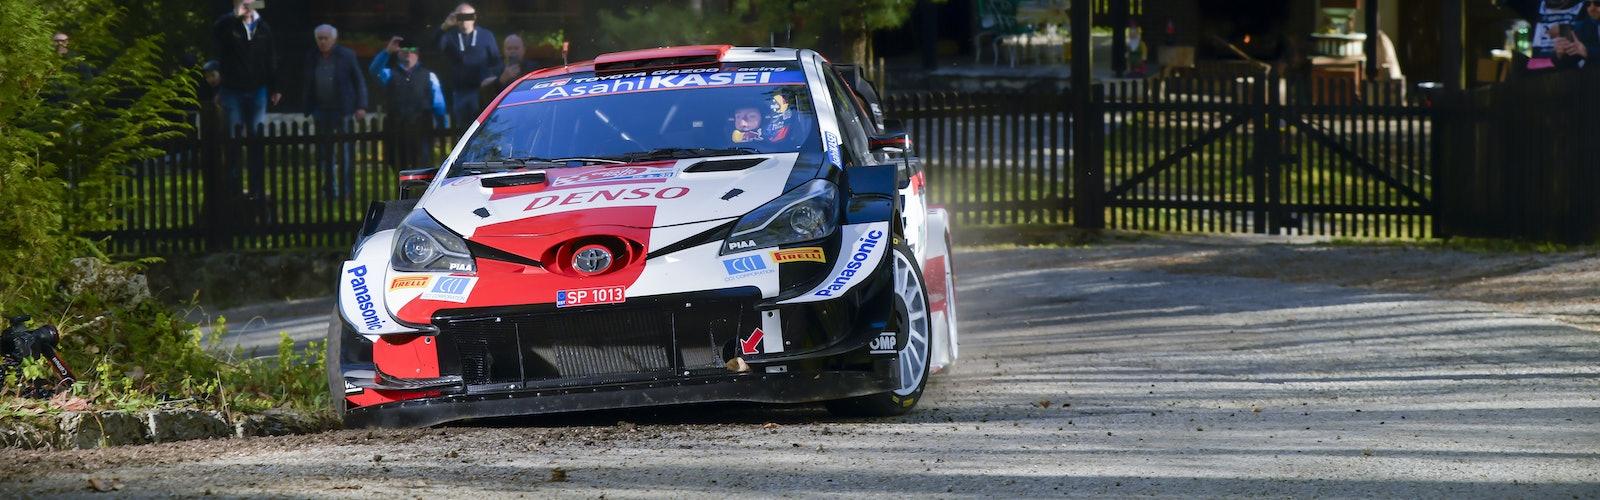 WRC_2021_Rd.3_253